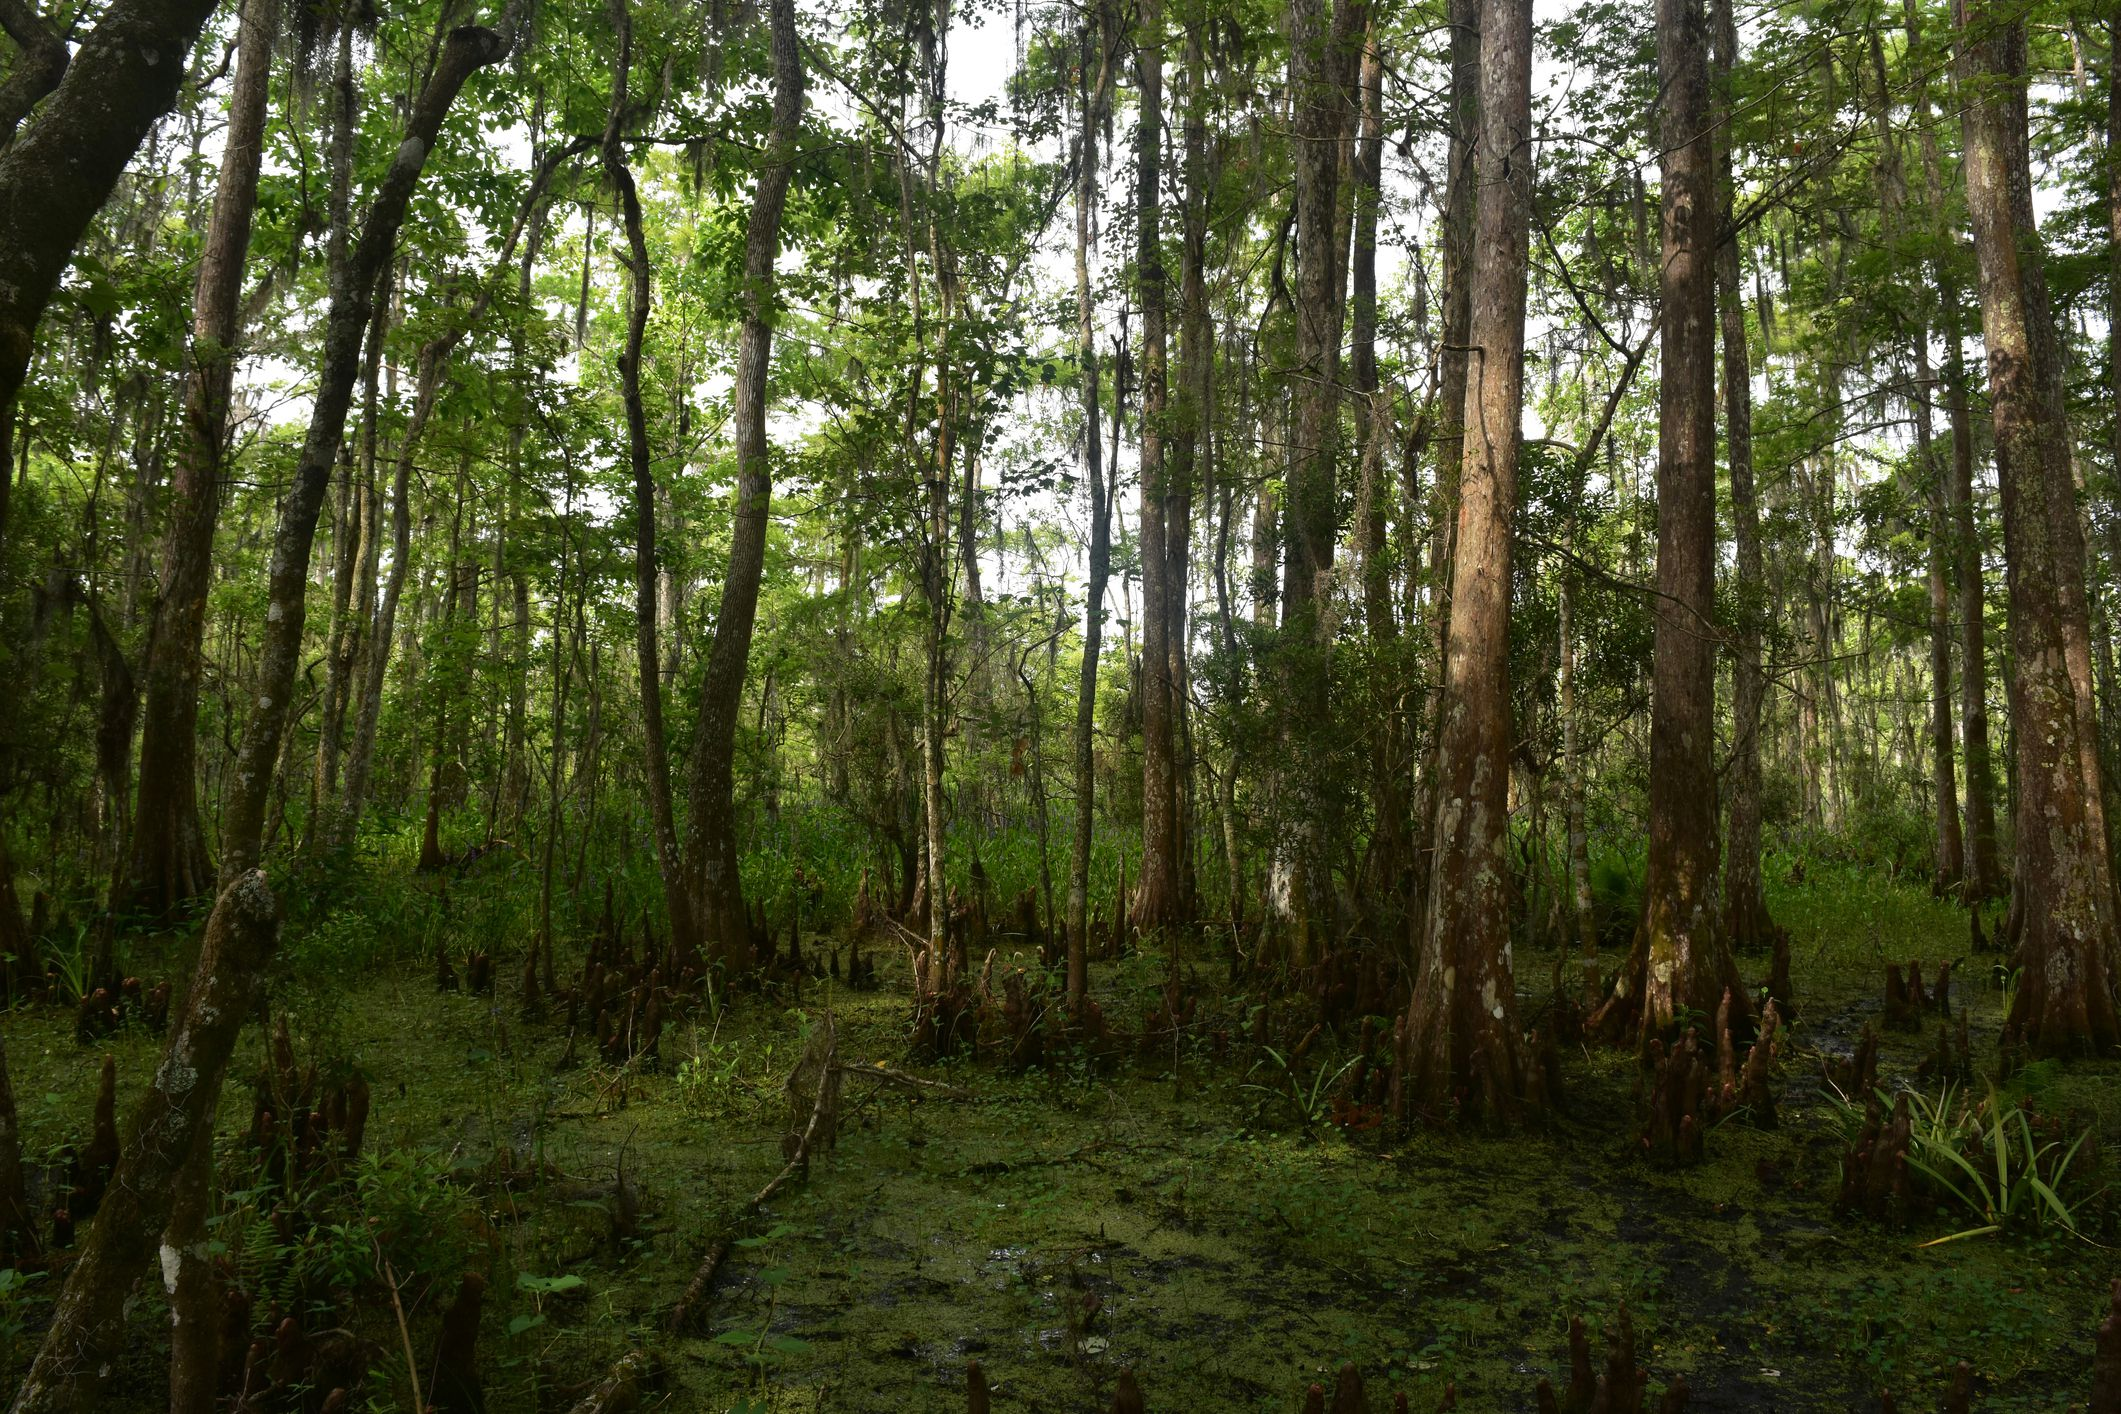 Barataria Preserve in New Orleans